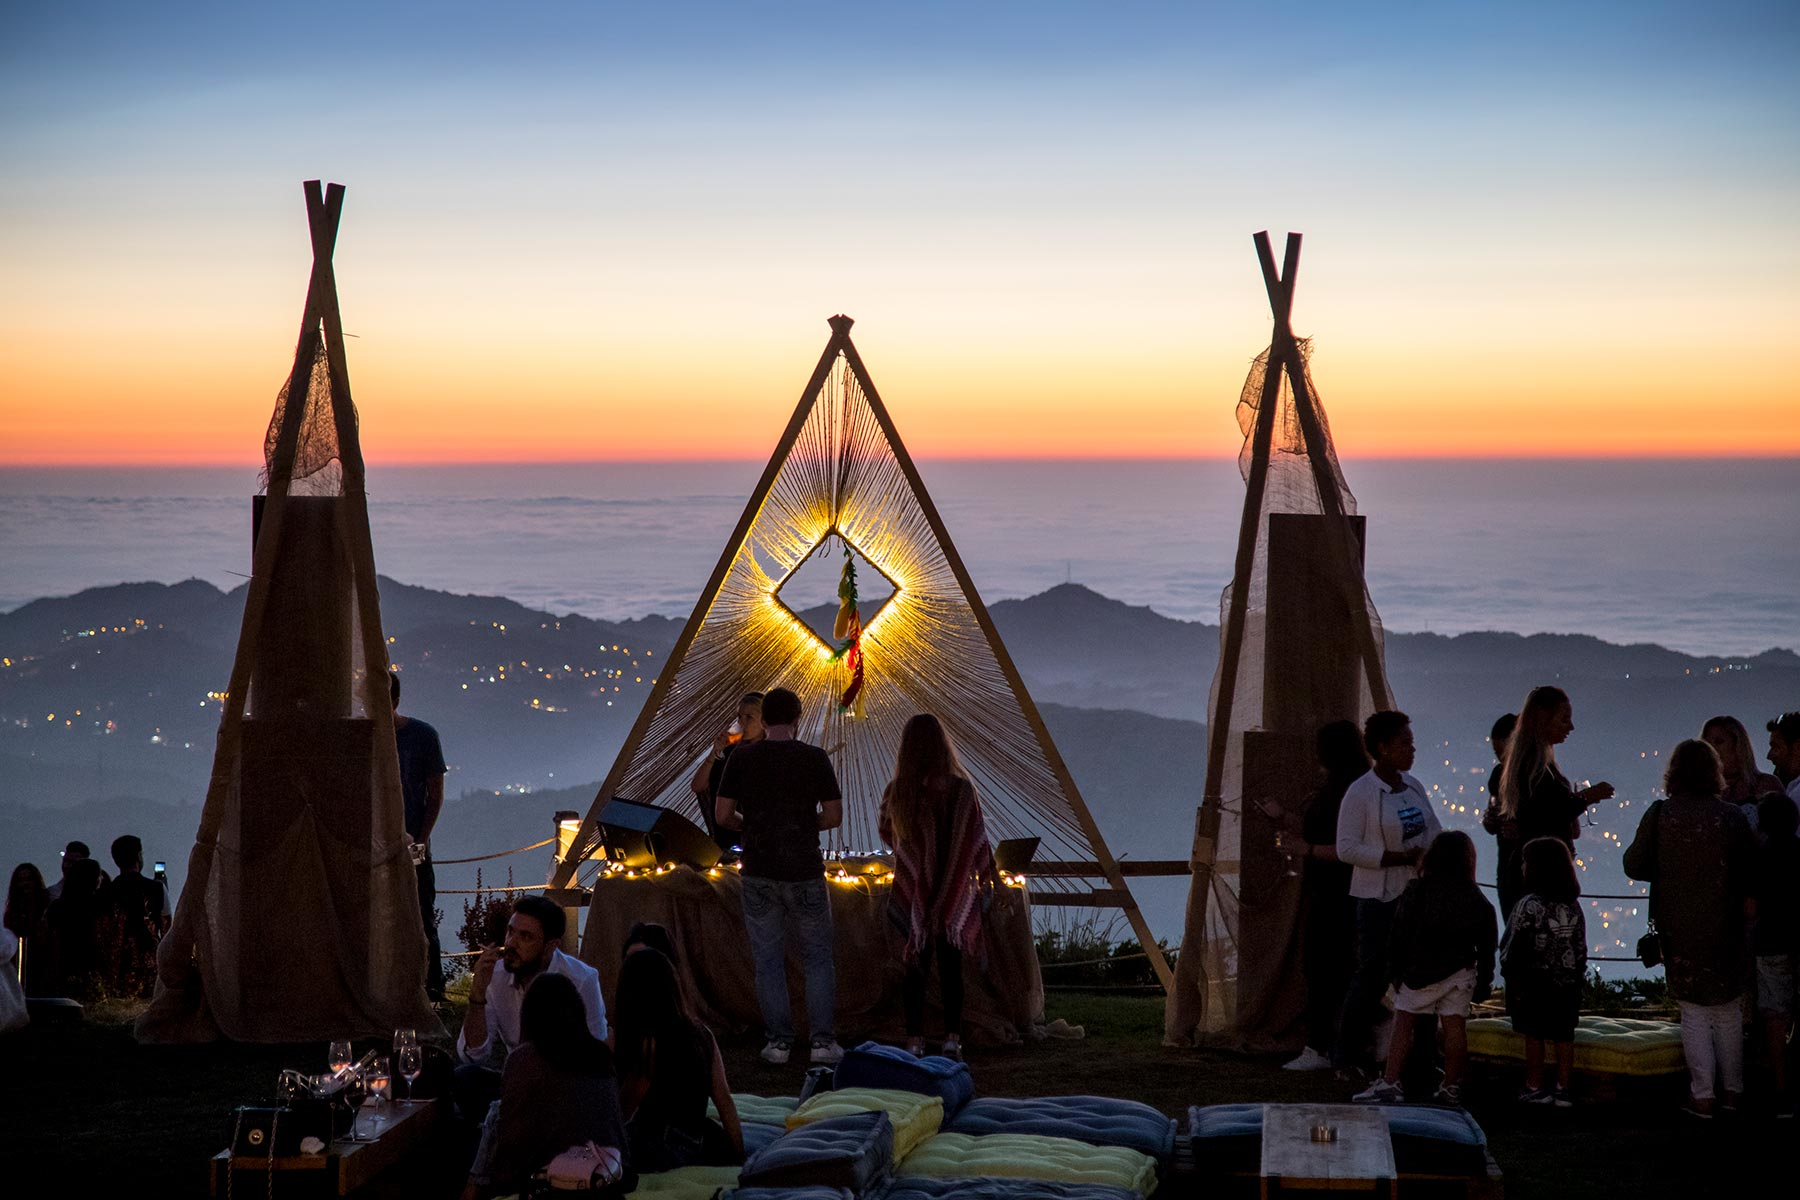 17-sexiest-sunset-spots-odine-mzaar-kfardebianne-lebanon-traveler